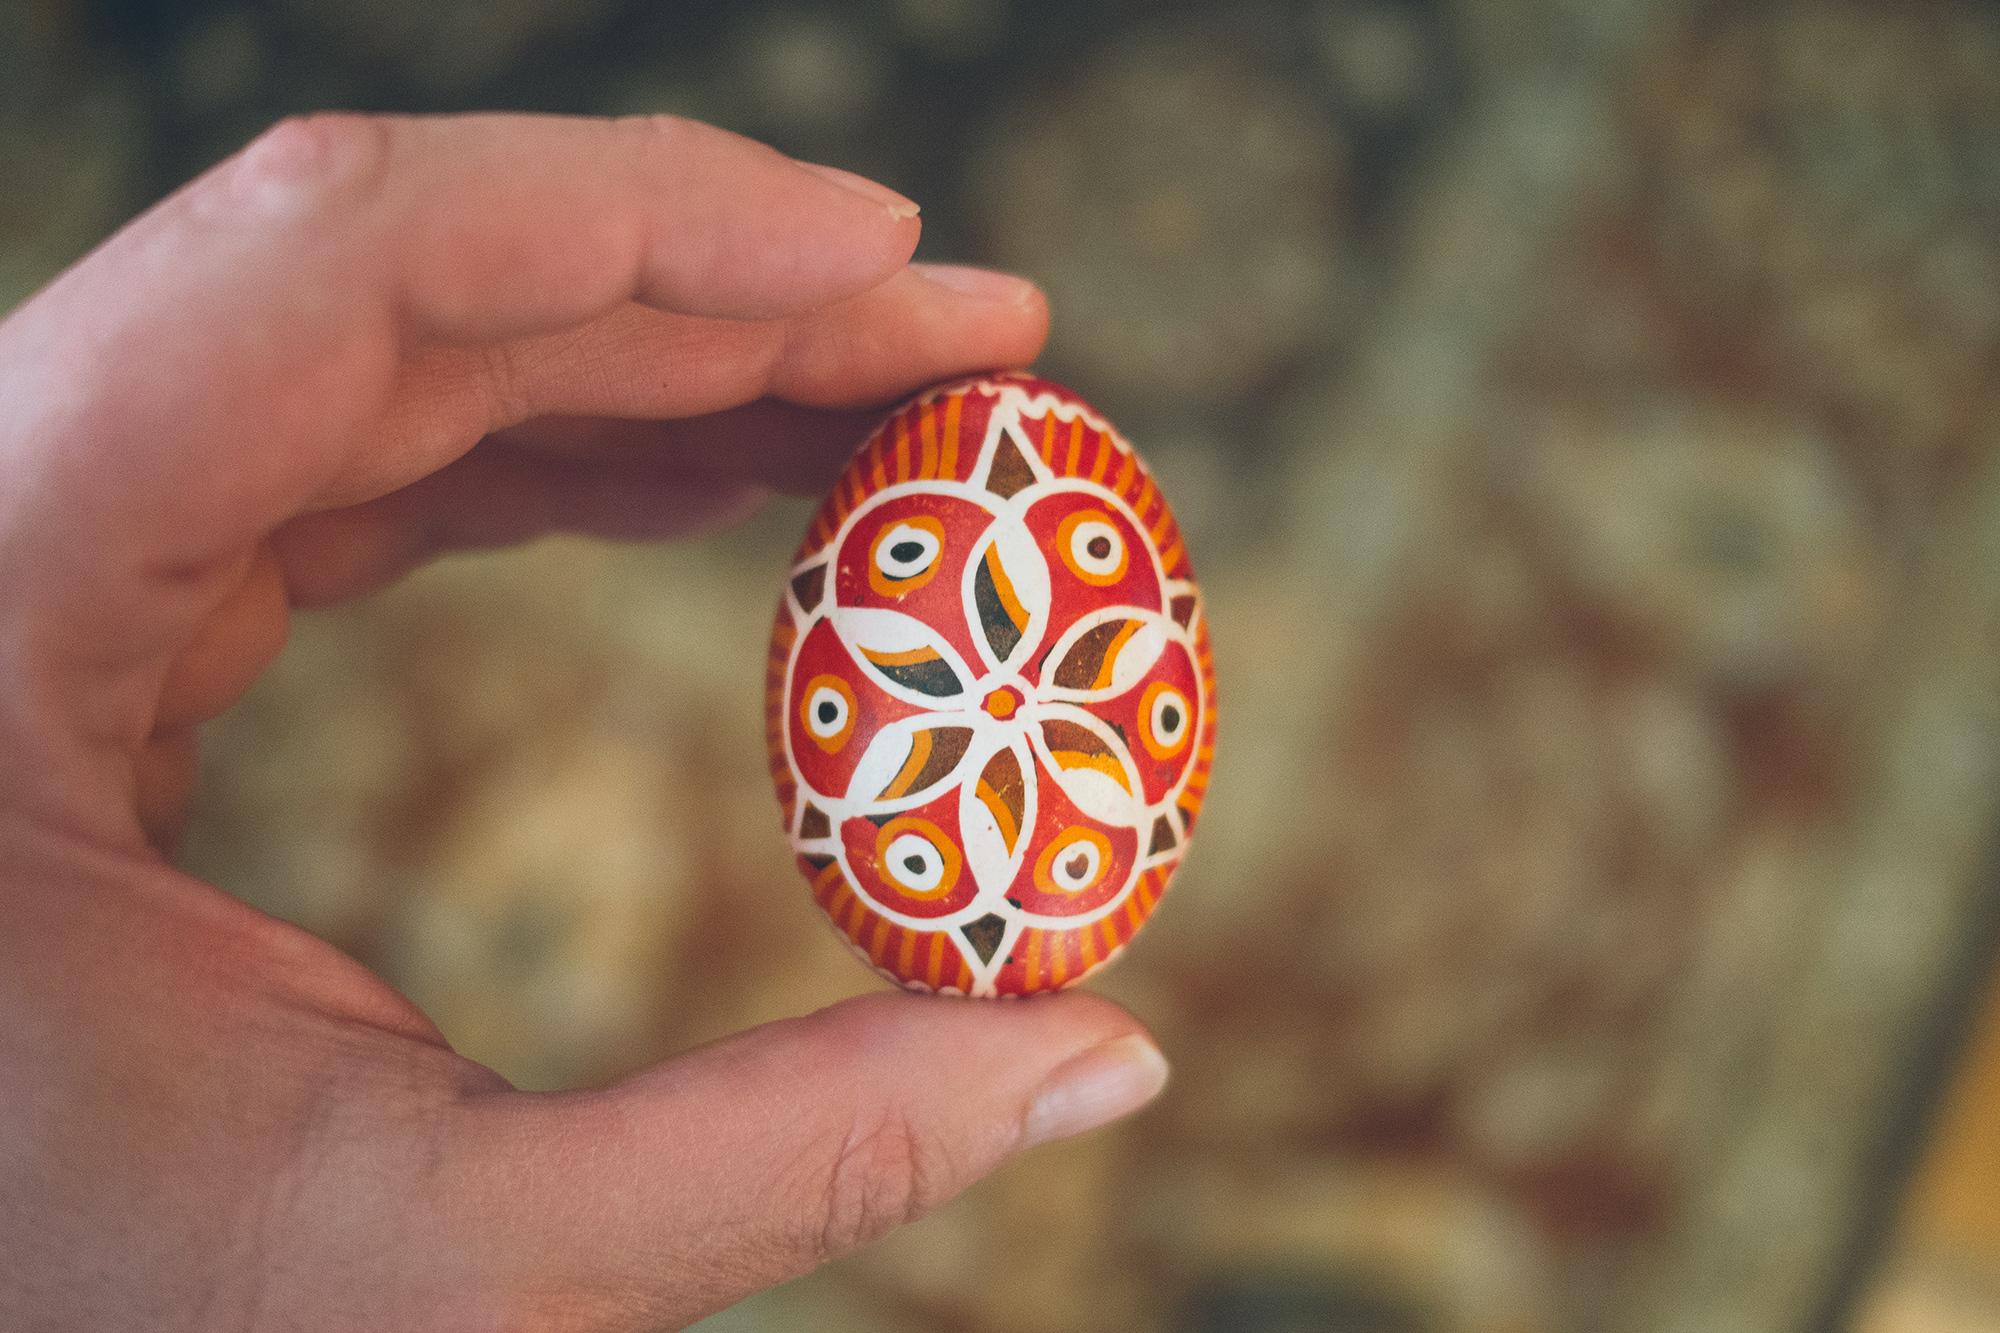 A man holding an Easter egg